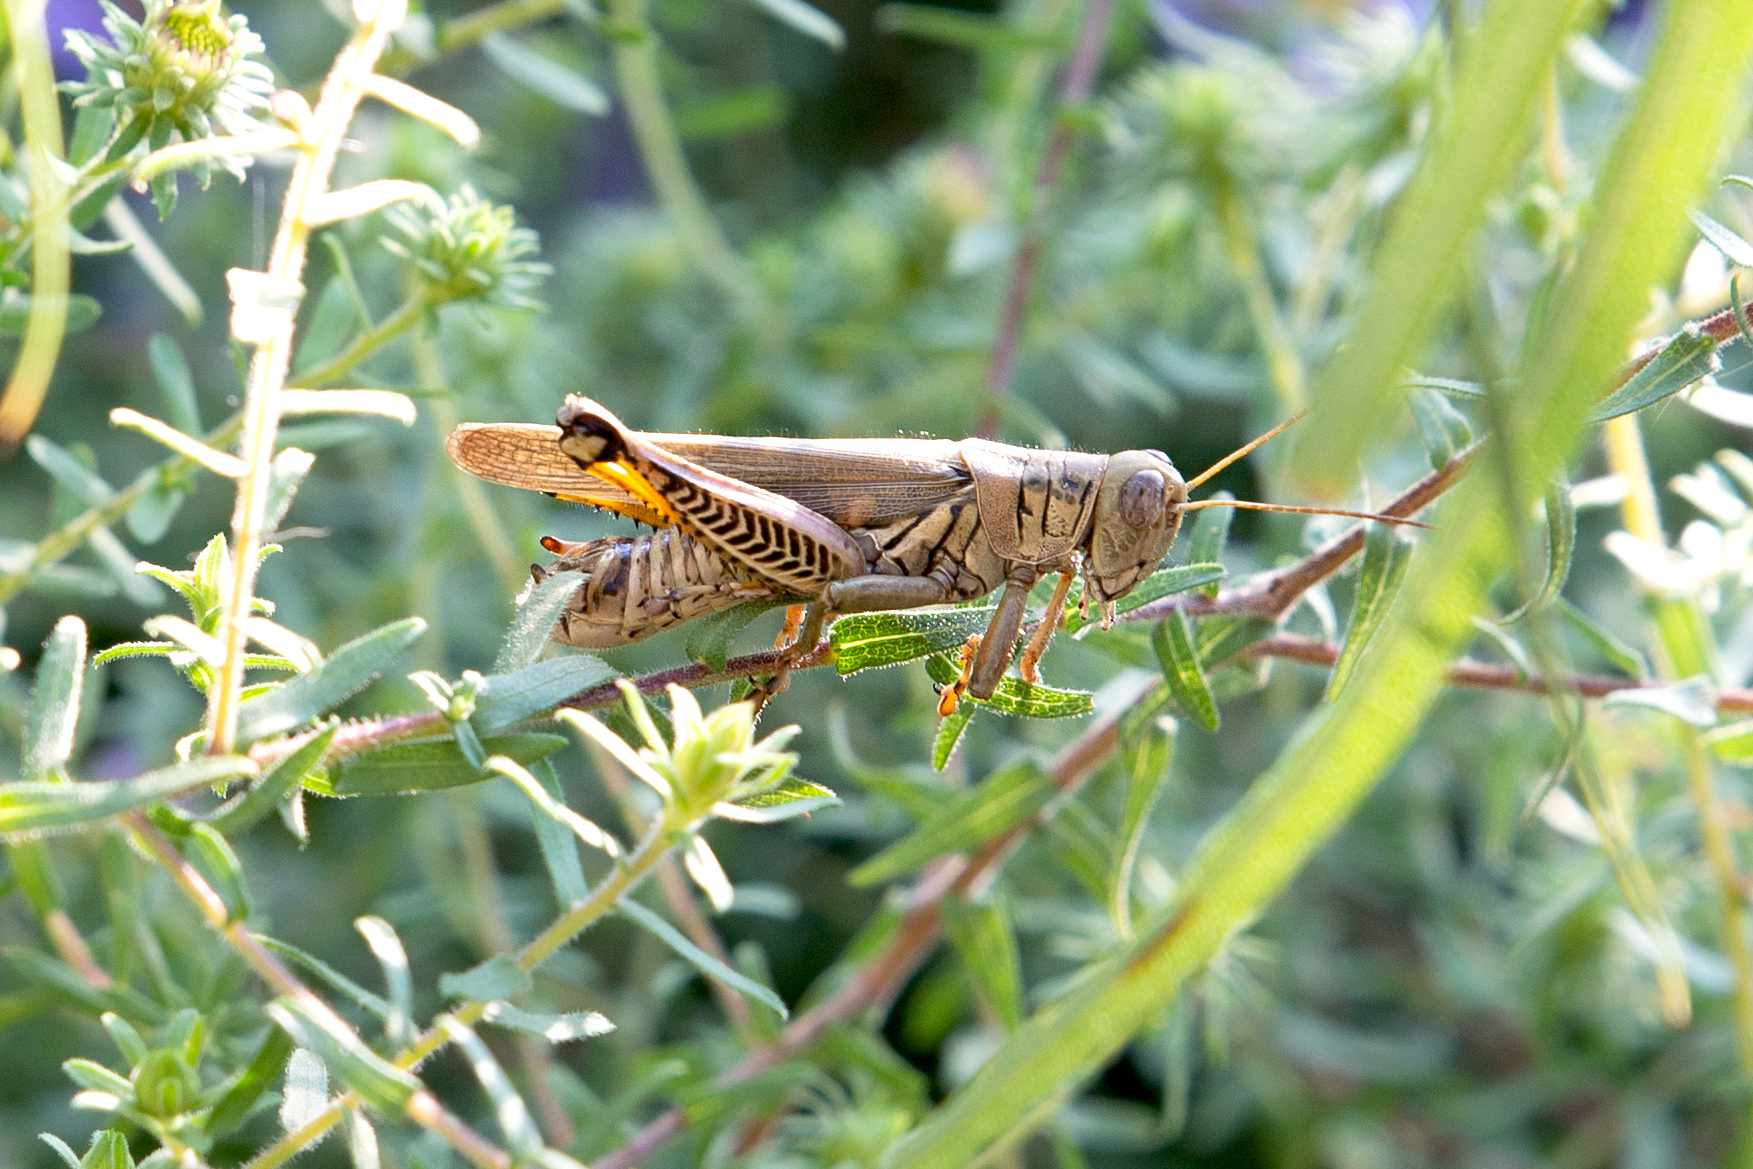 Brown grasshopper climbing on thin plant stem closeup